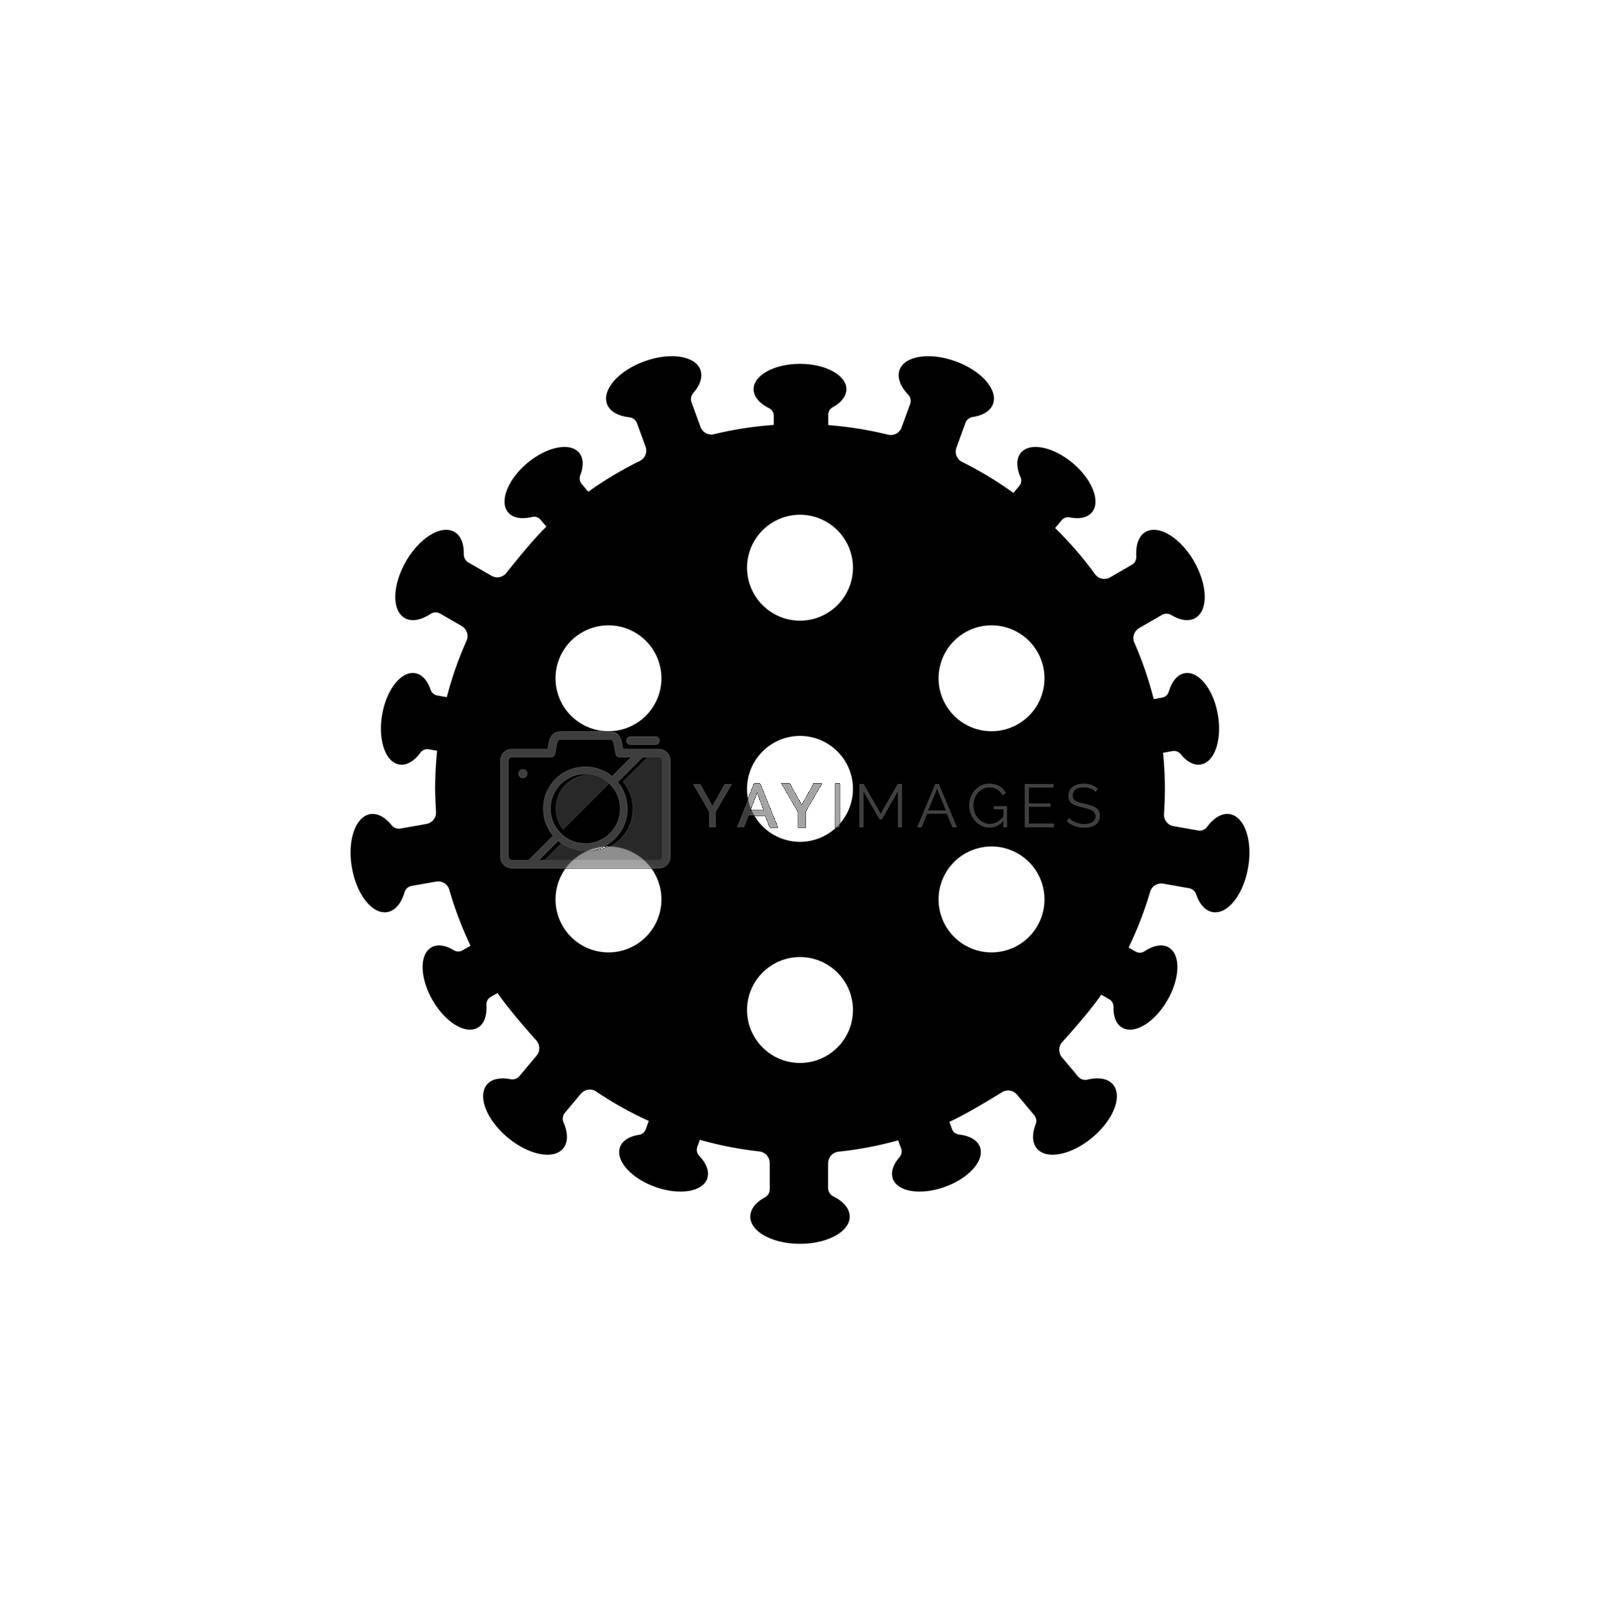 Coronavirus Bacteria 2019-nCoV vector glyph icon. Medicine sign. Graph symbol for medical web site and apps design, logo, app, UI